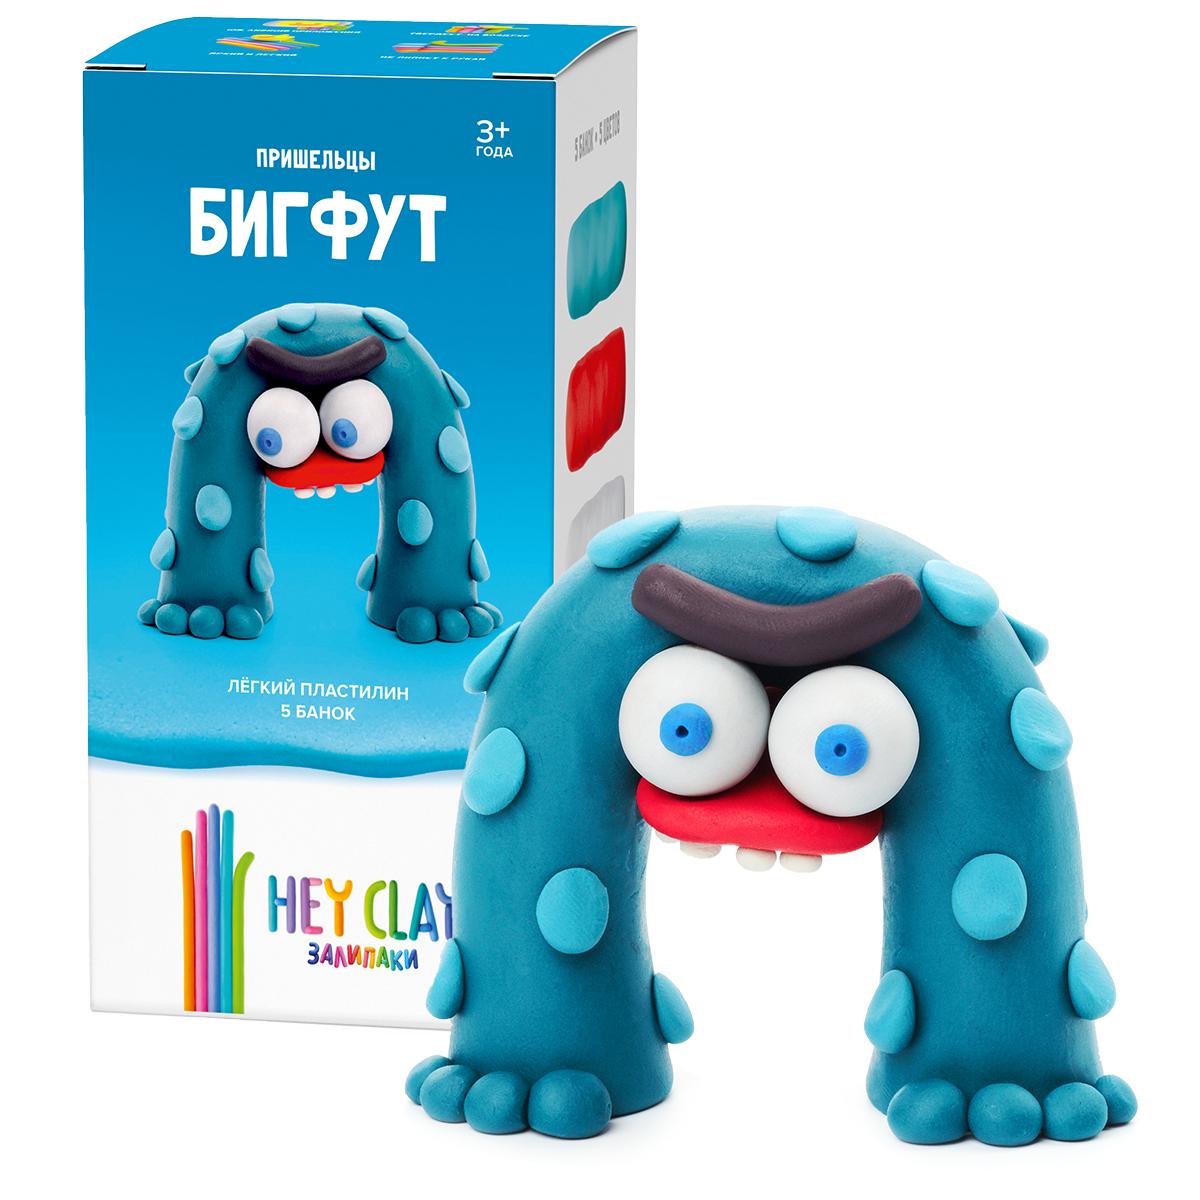 Легкий пластилин залипаки HEY CLAY - Бигфут